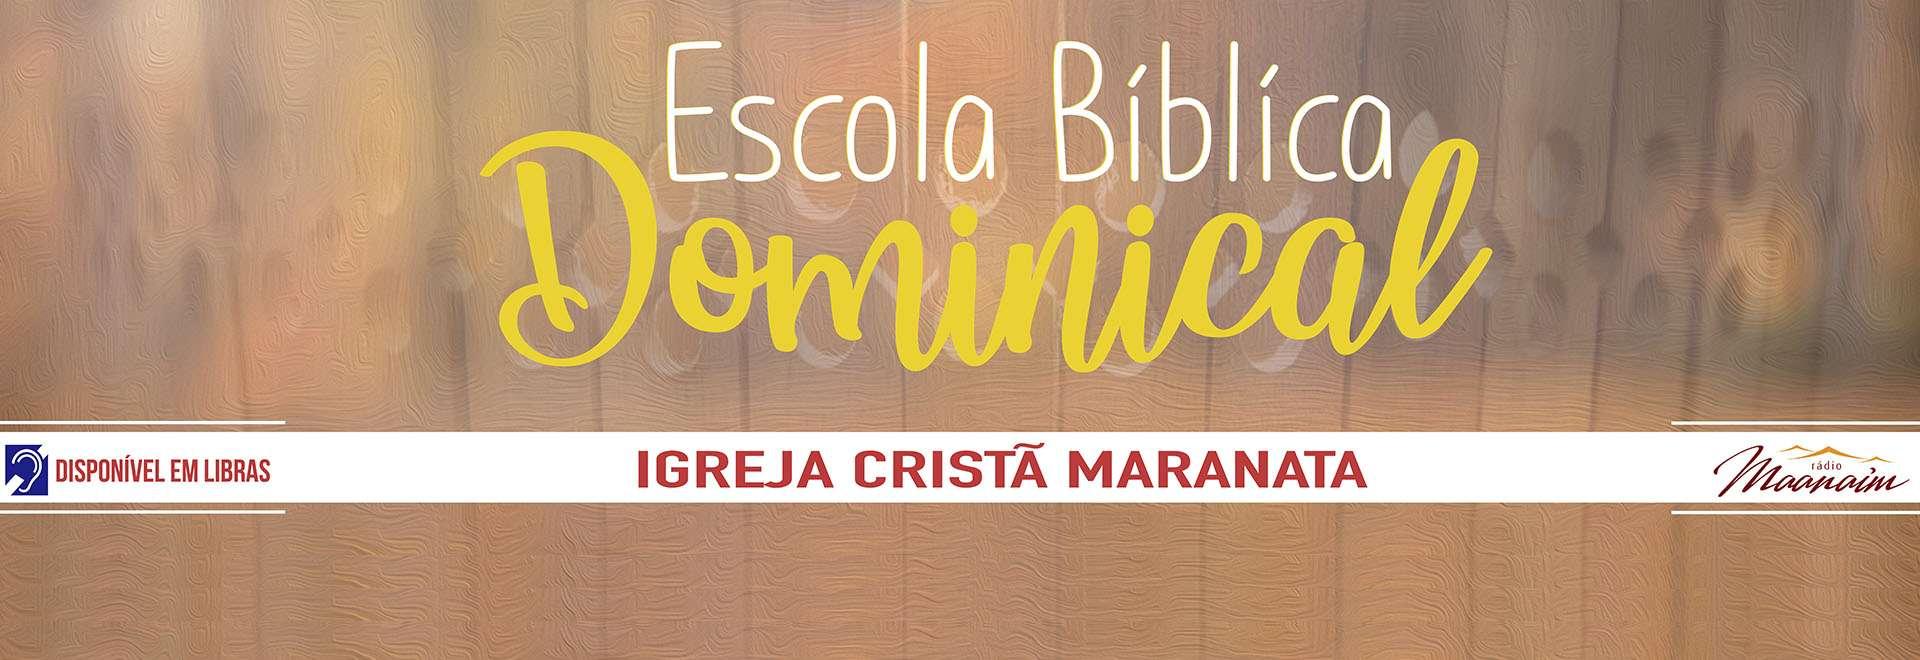 Participações da EBD da Igreja Cristã Maranata - 24/01/2021